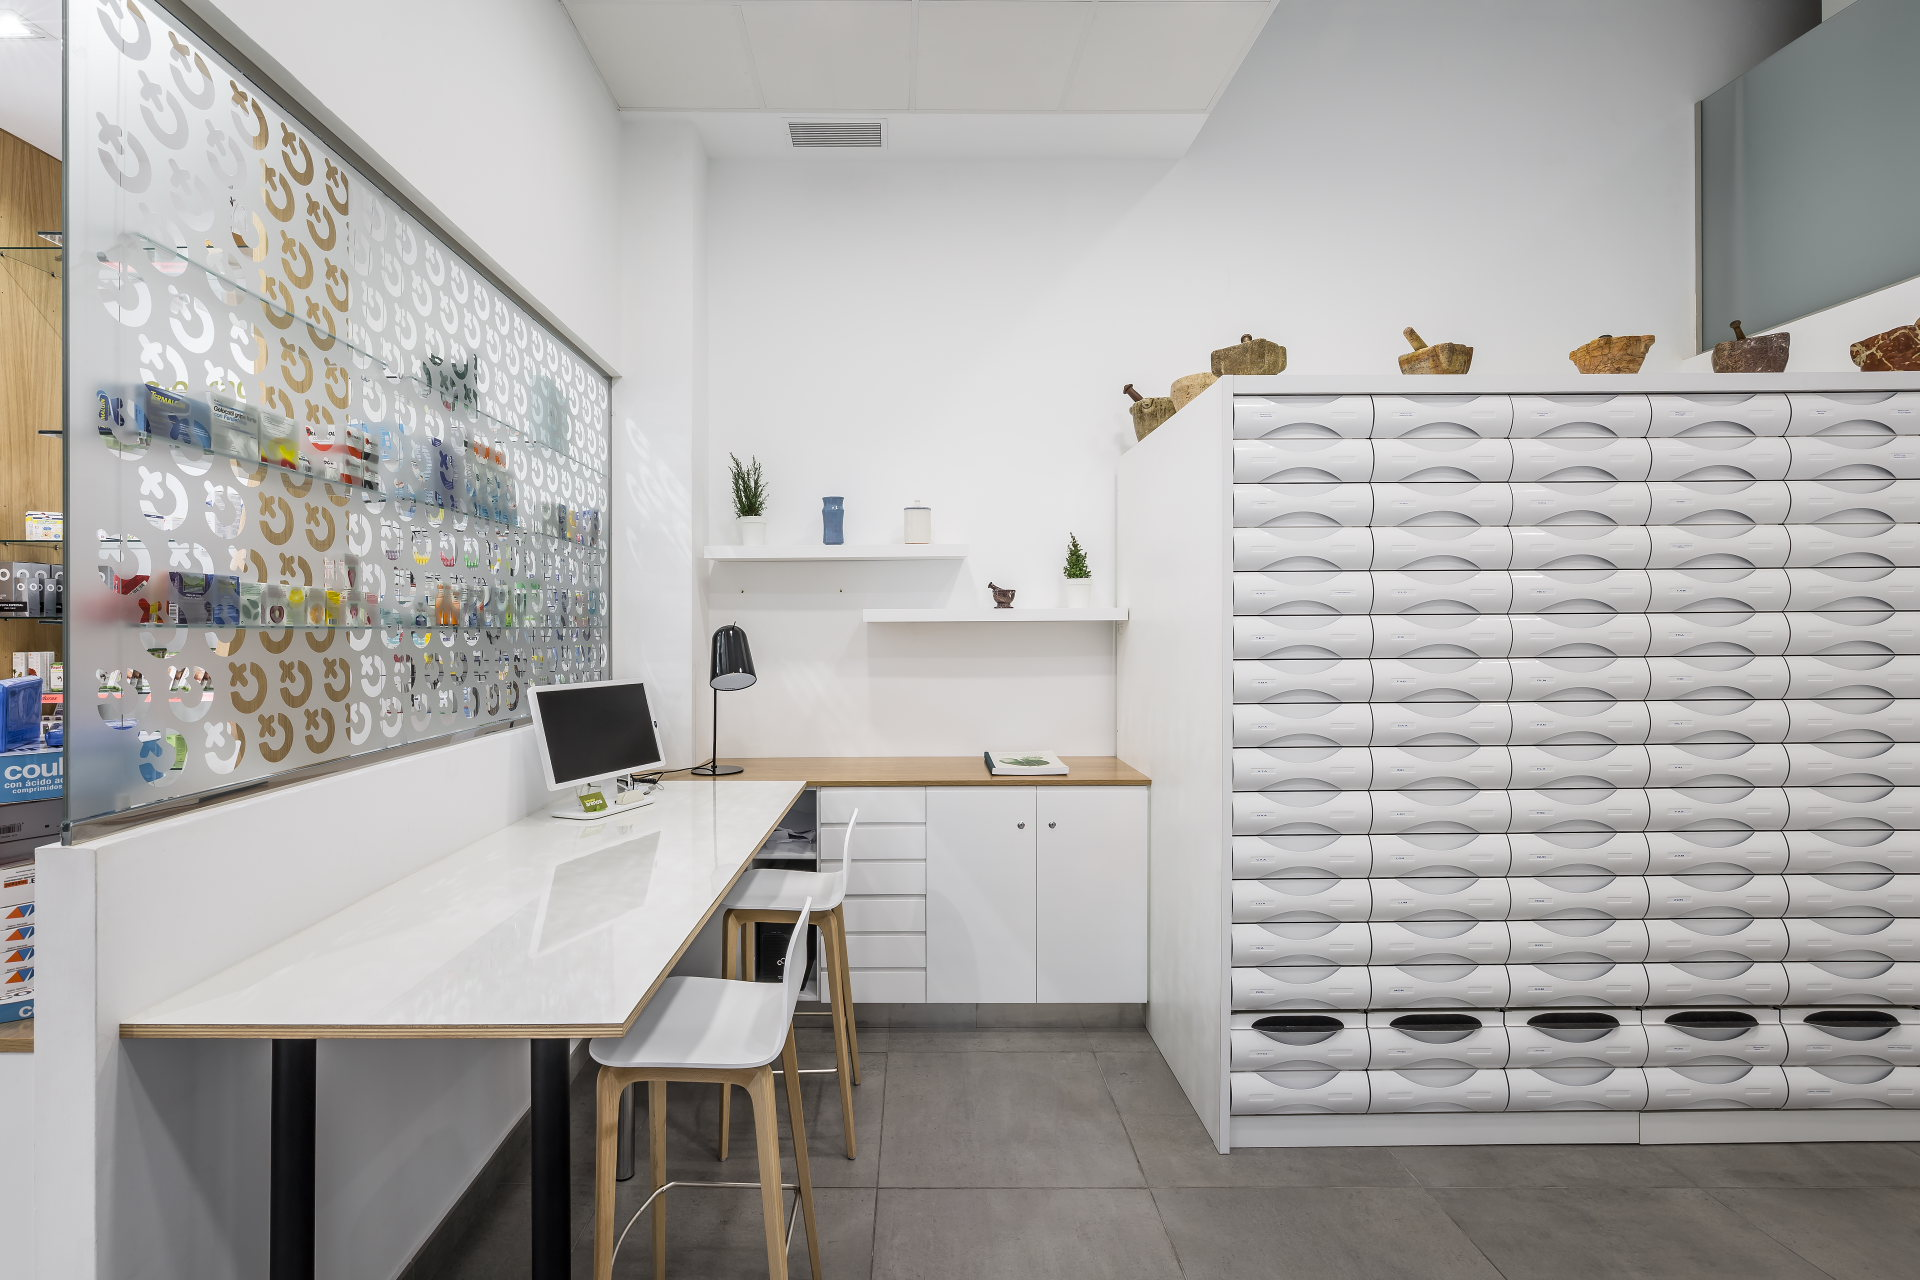 fotografia-arquitectura-valencia-german-cabo-d'estudio-farmacia-arenos-almassora-castellon (15)